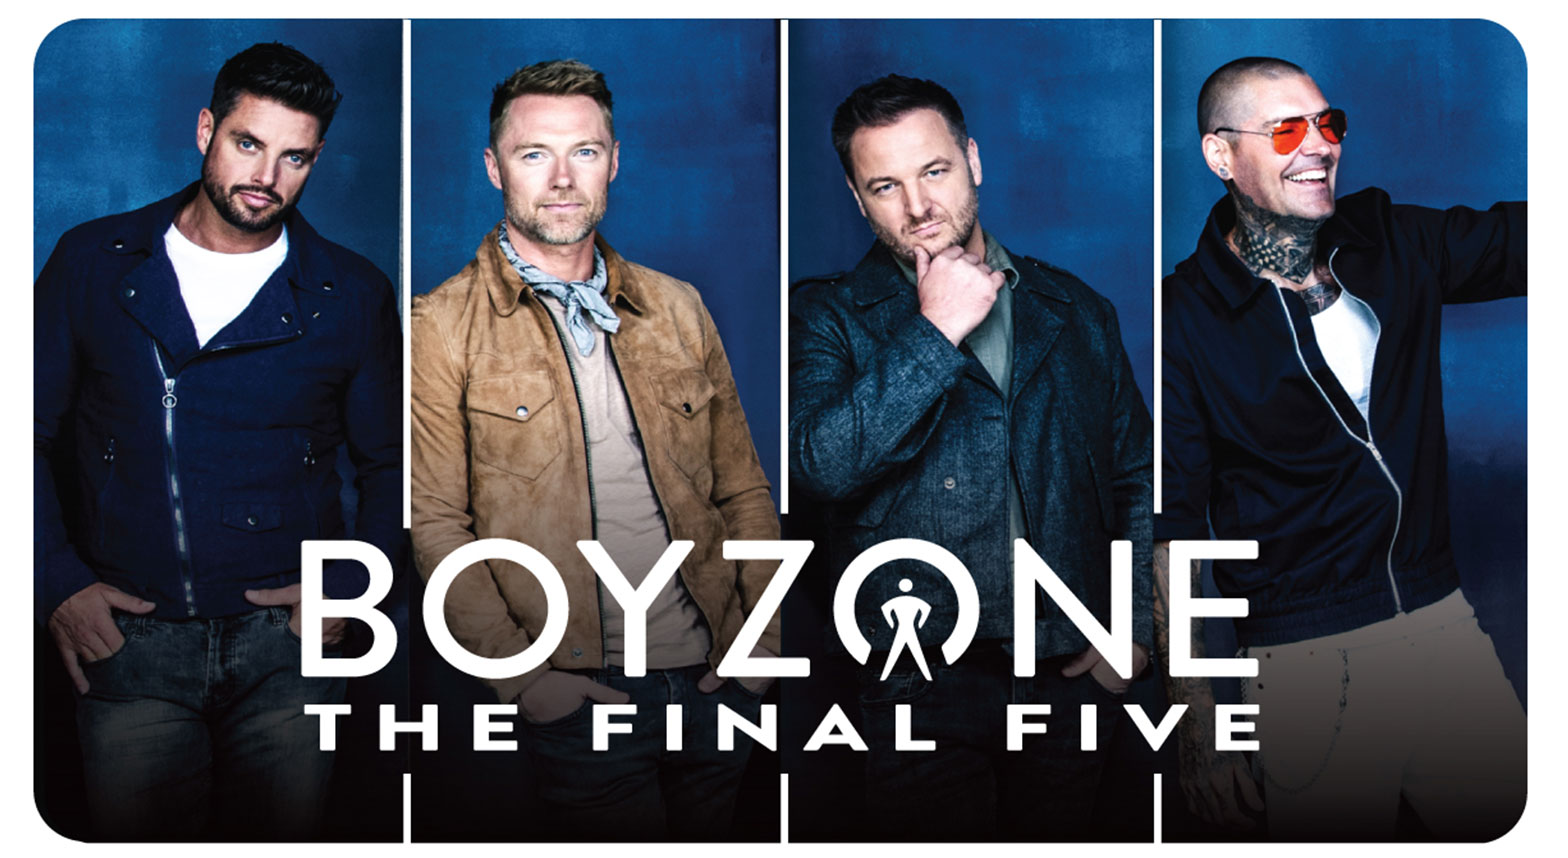 boyzone-final-five-arenas.jpg